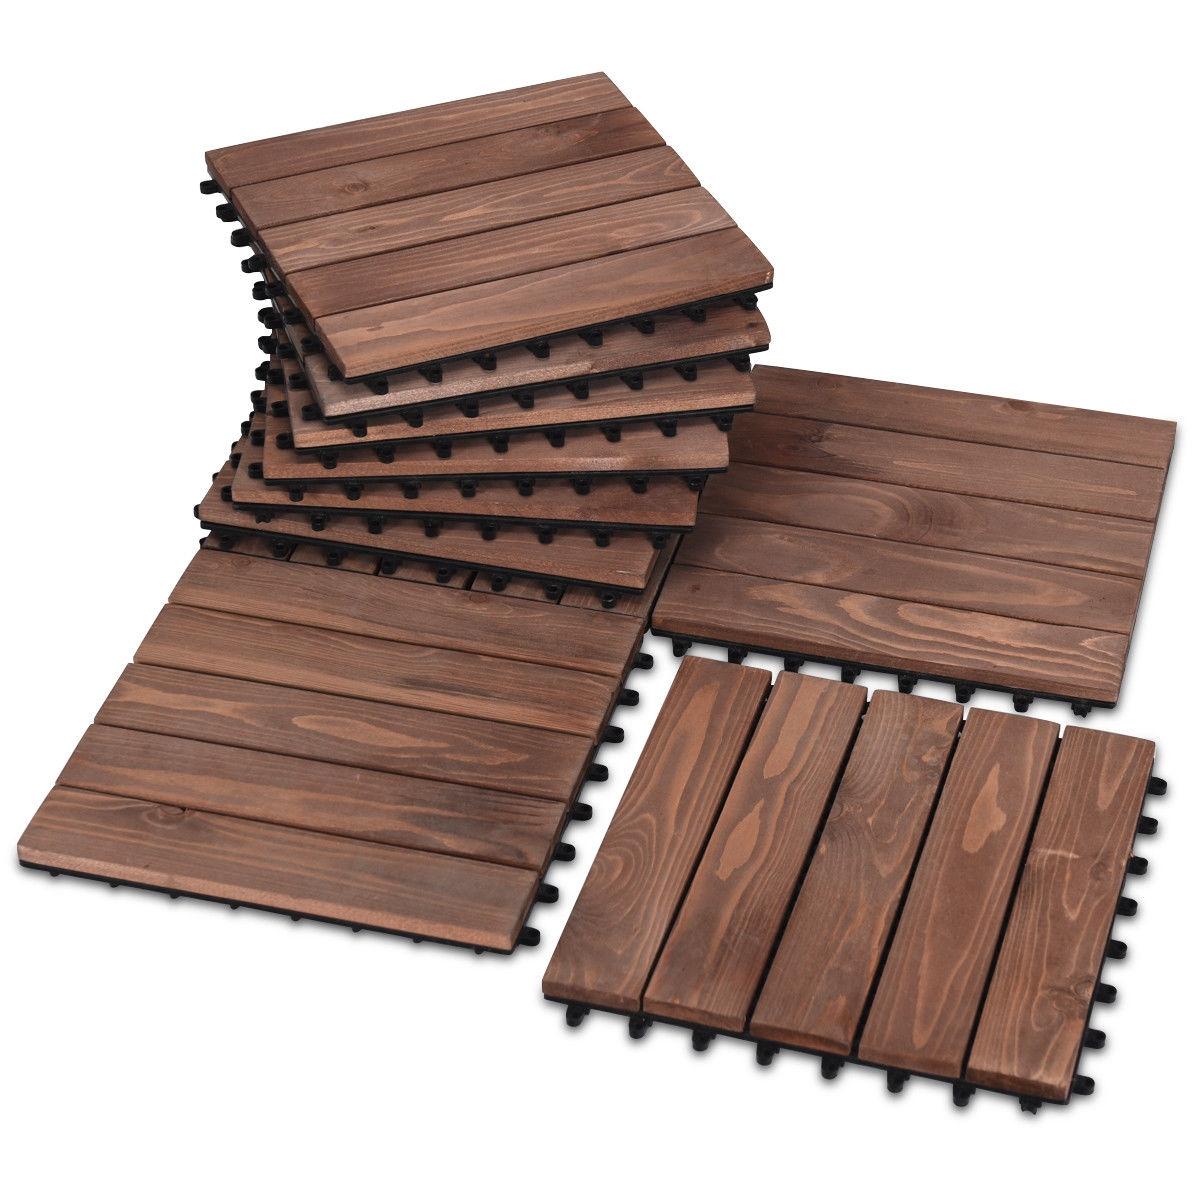 12 X Patio Interlocking Flooring, Outdoor Interlocking Tiles For Patio